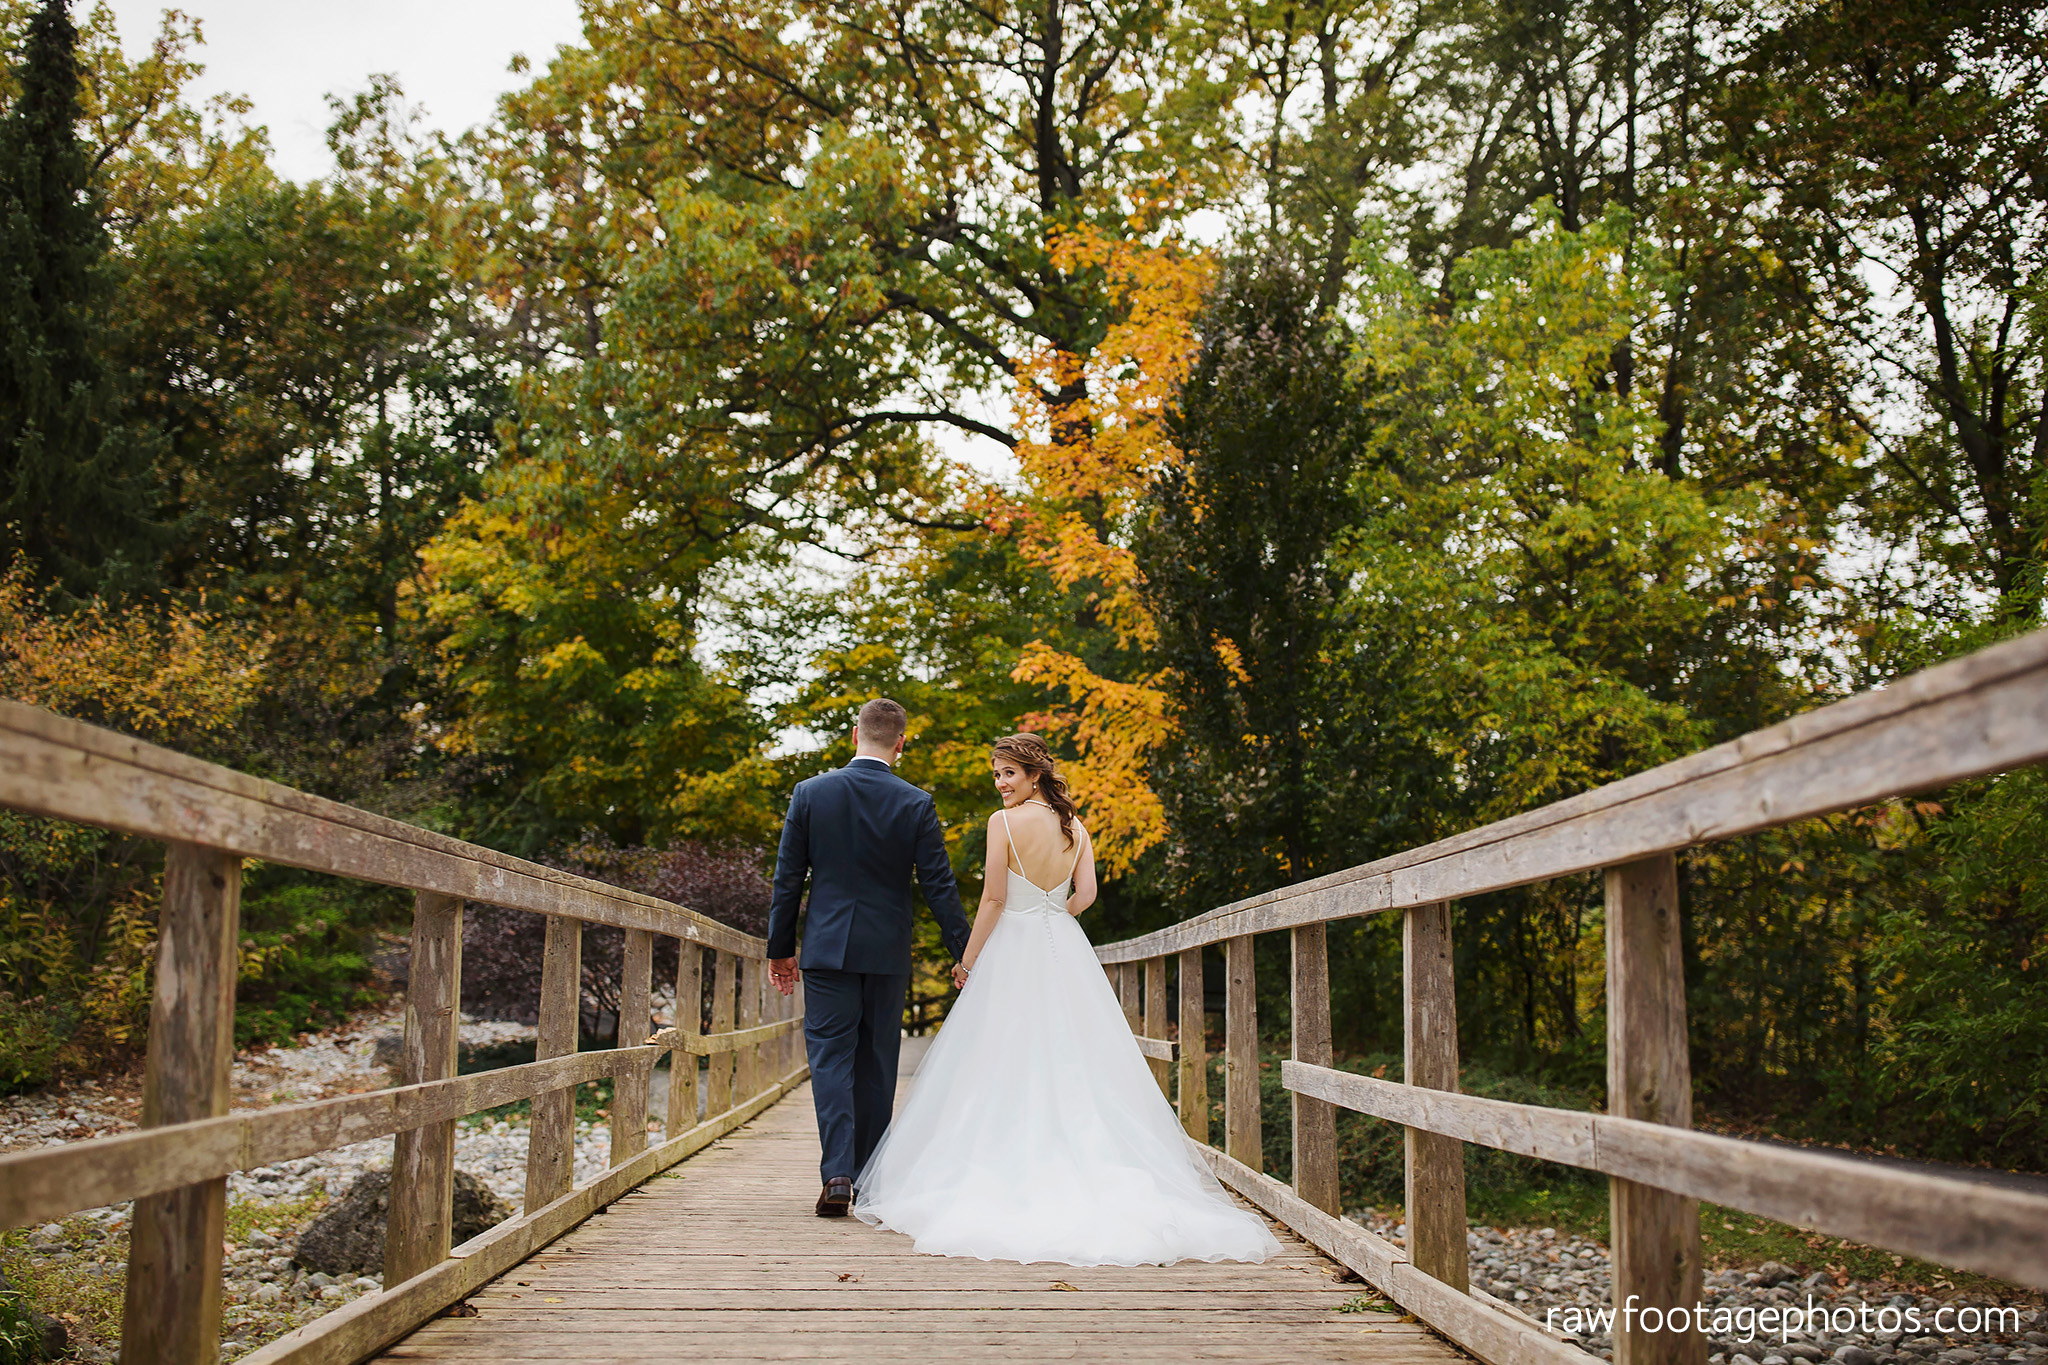 london_ontario_wedding_photographer-civic_gardens-springbank_park-succulent_bouquet-fall_wedding-bridge-raw_footage_photography059.jpg